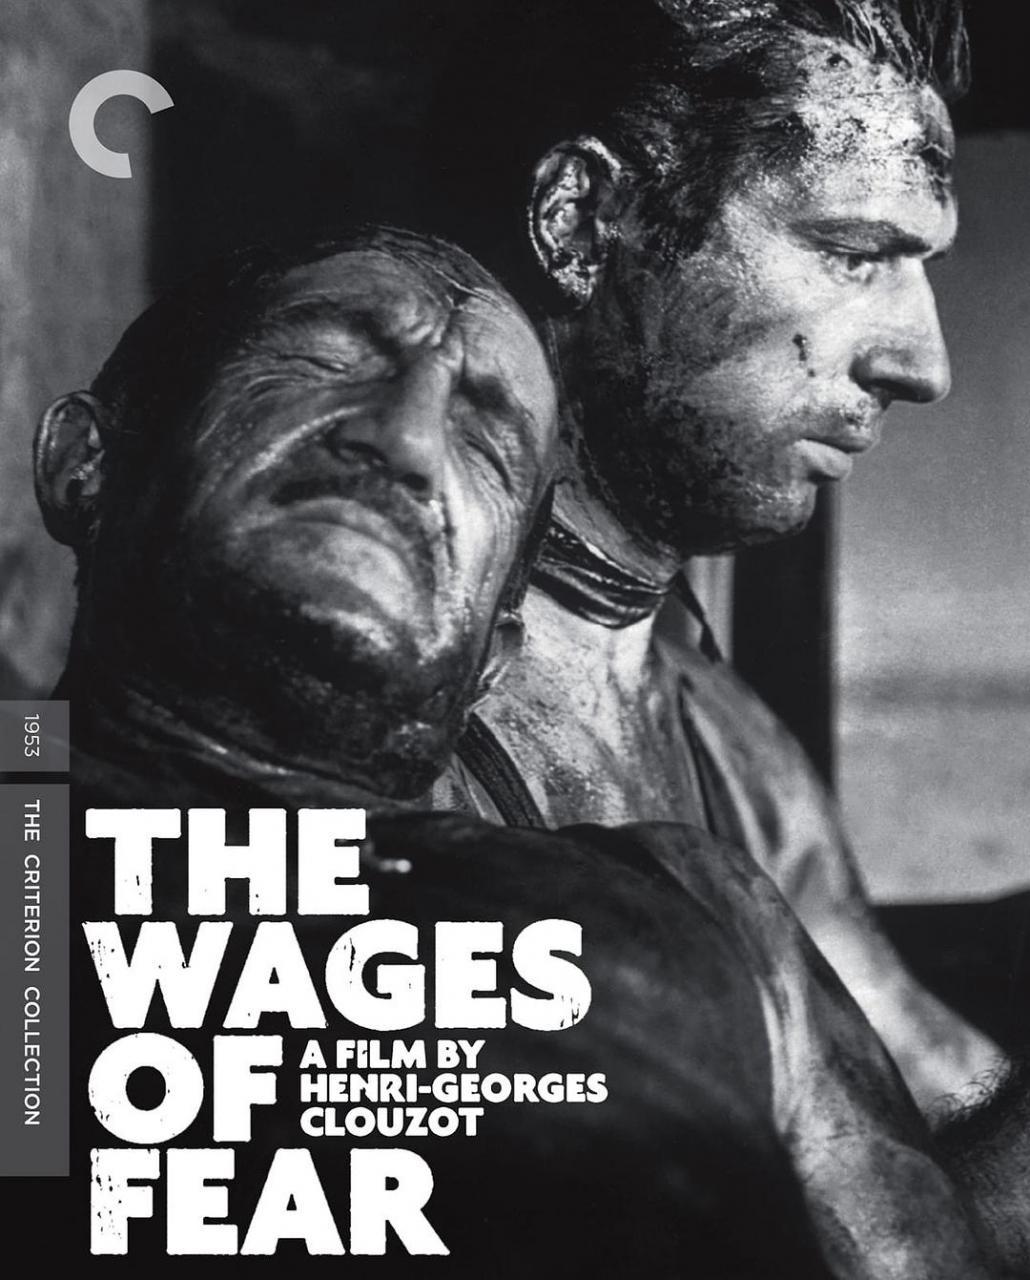 恐惧的代价 蓝光原盘下载+高清MKV版/九死一生 / 恐怖的报酬 / 恐惧的酬劳 / The Wages of Fear 1953 Le salaire de la peur 45.8G插图